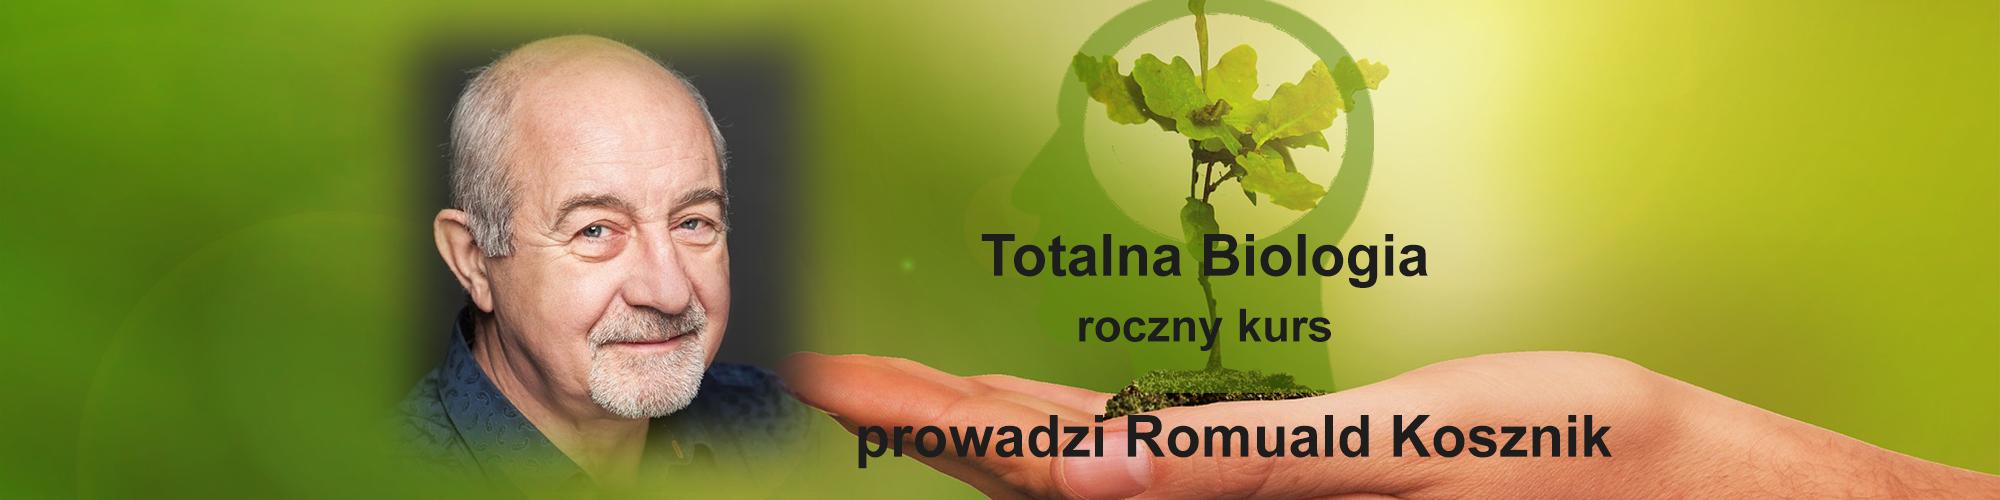 totalnabiologia1-banner